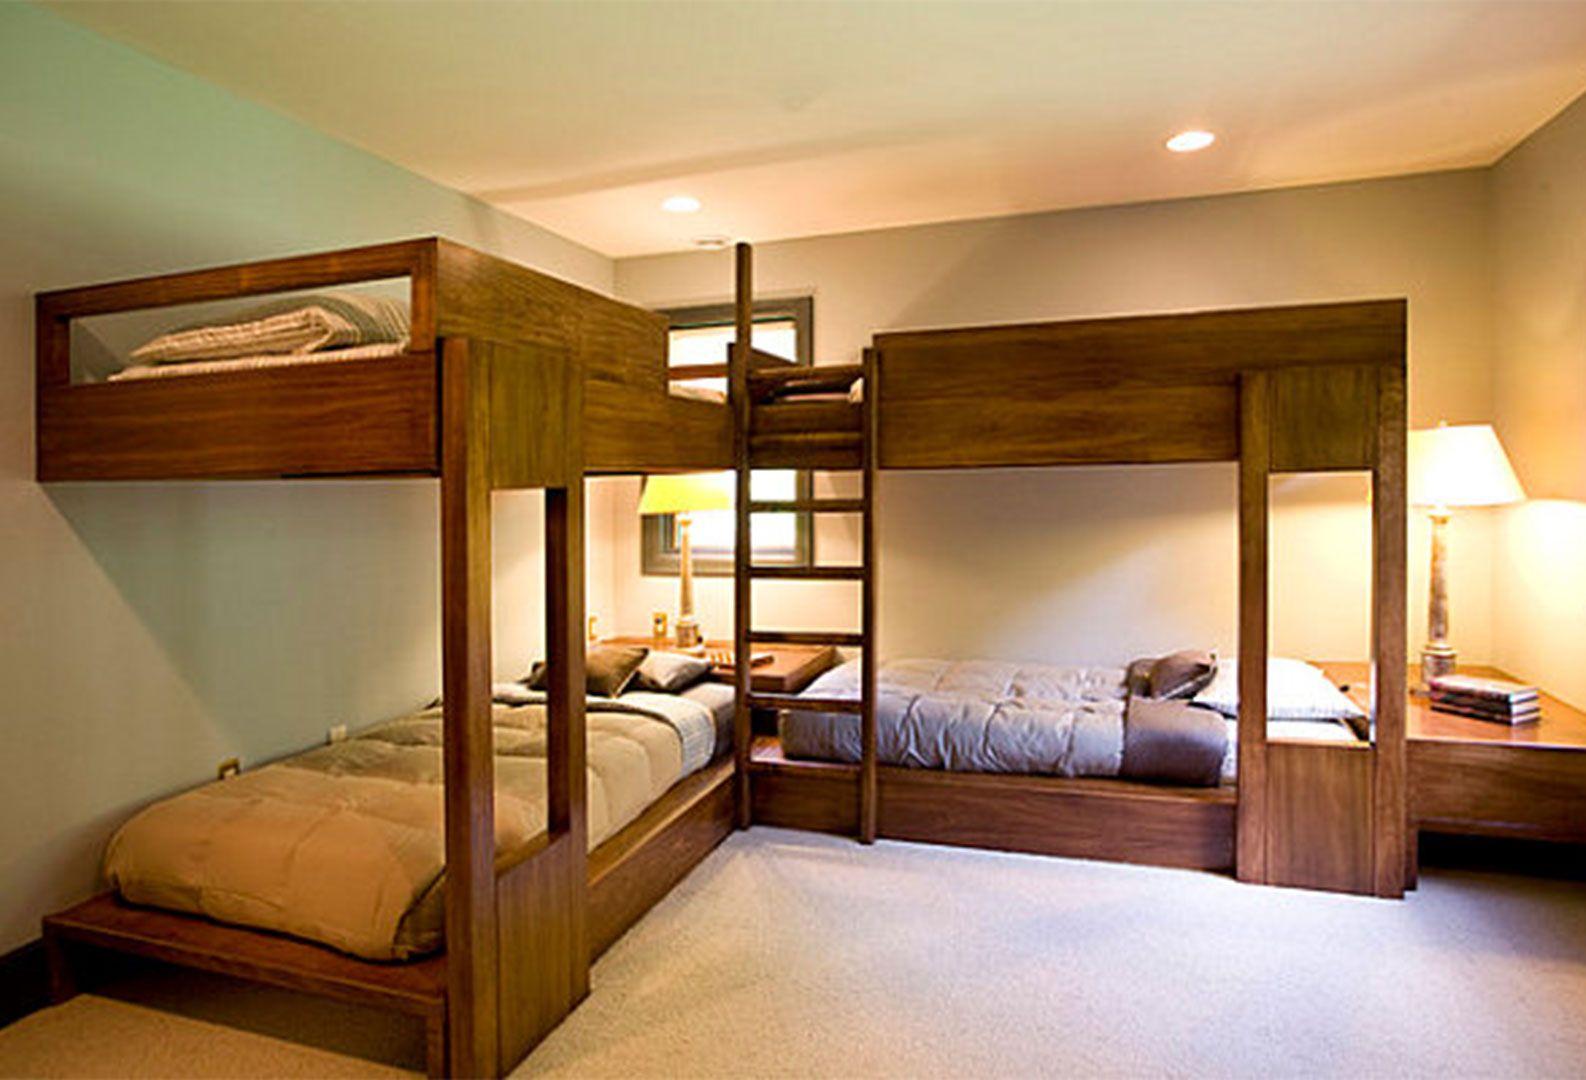 Bunk bed loft ideas  Modern Bedroom Ideas Bedroom Loft Bedroom For The Modern Home Hot